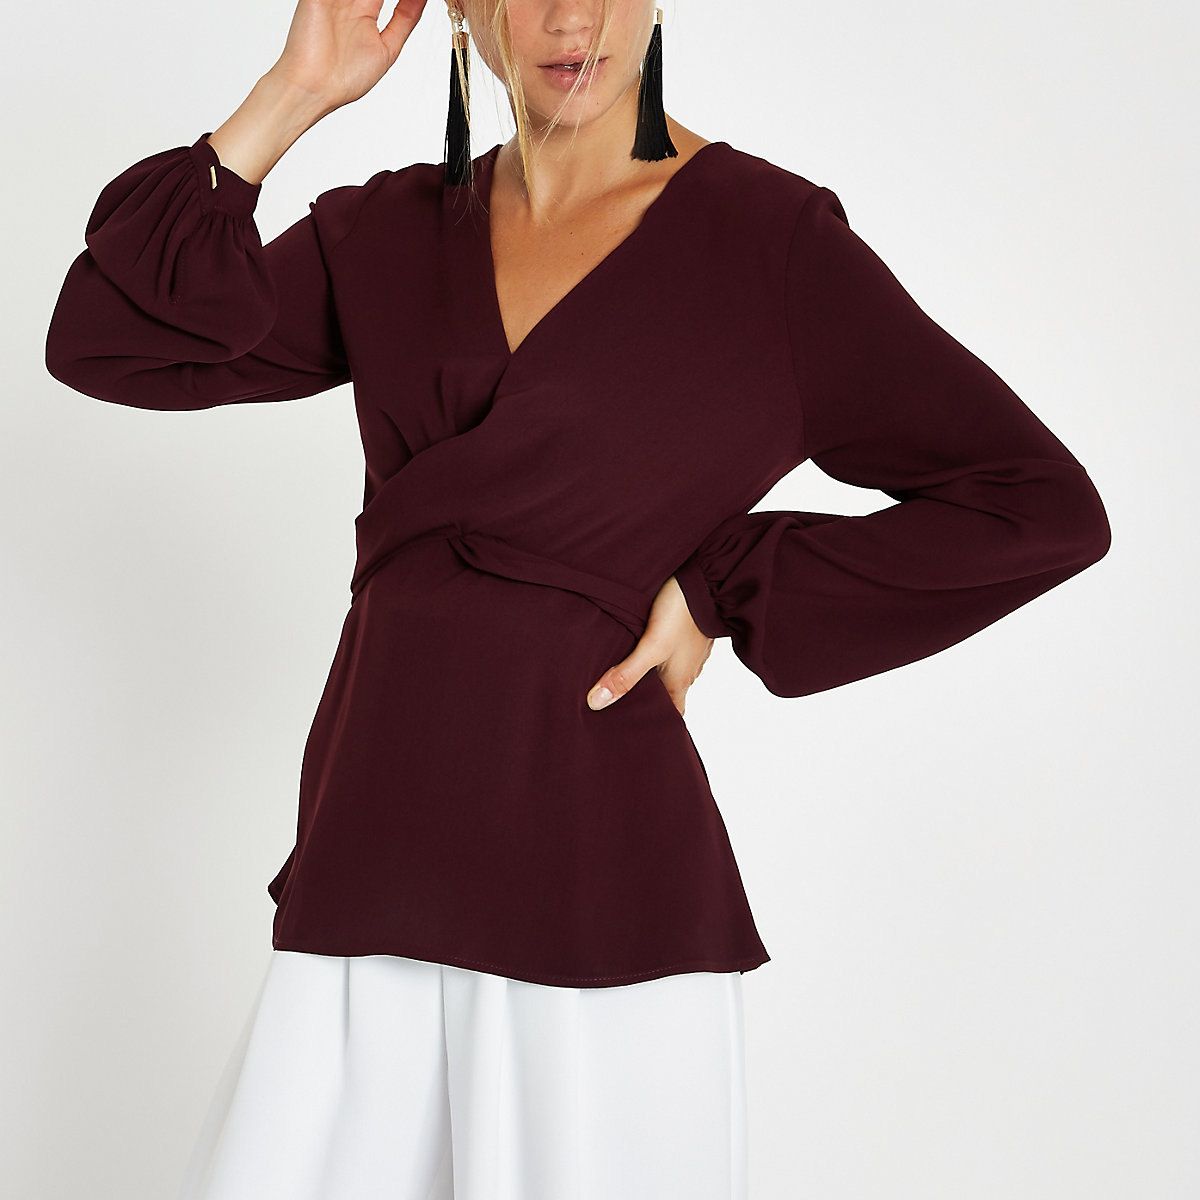 Dark red cross front tie back blouse